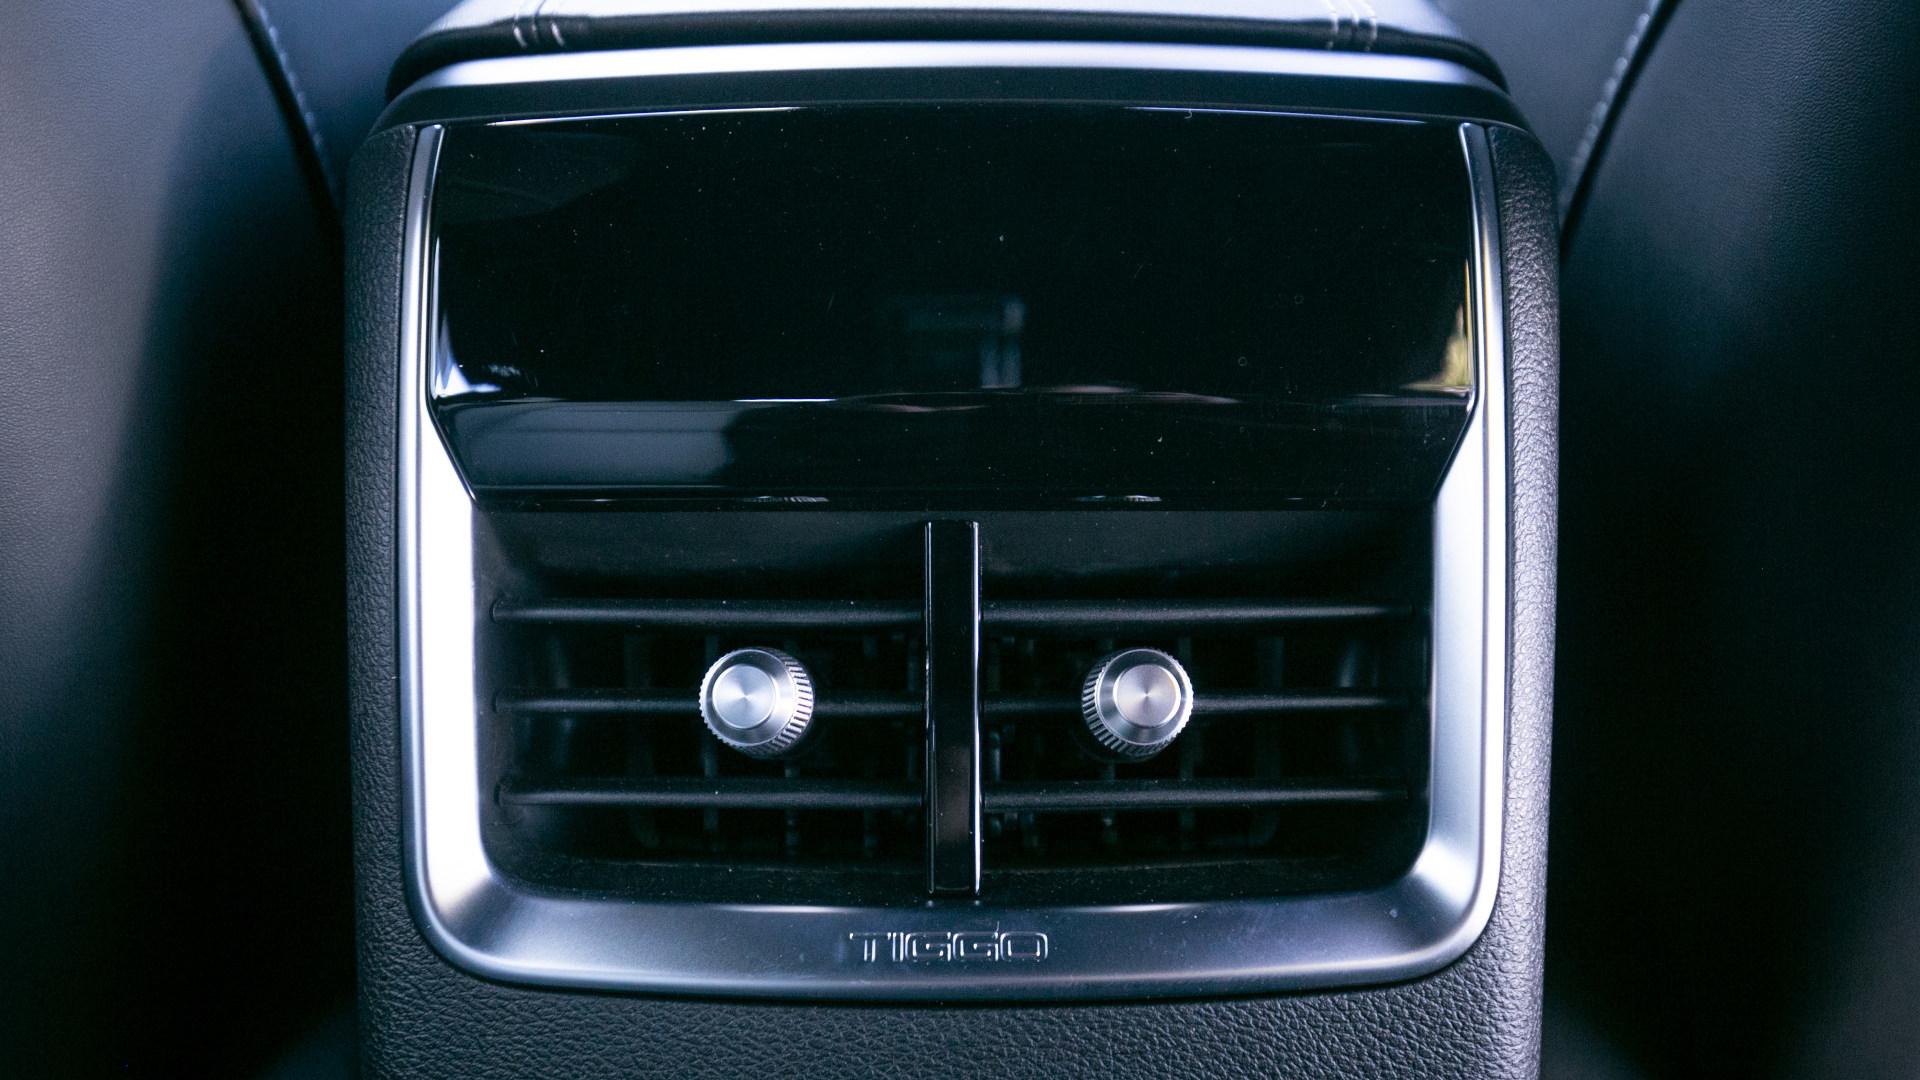 Chery Tiggo 7 Pro - Backseat Airconditioning Panel